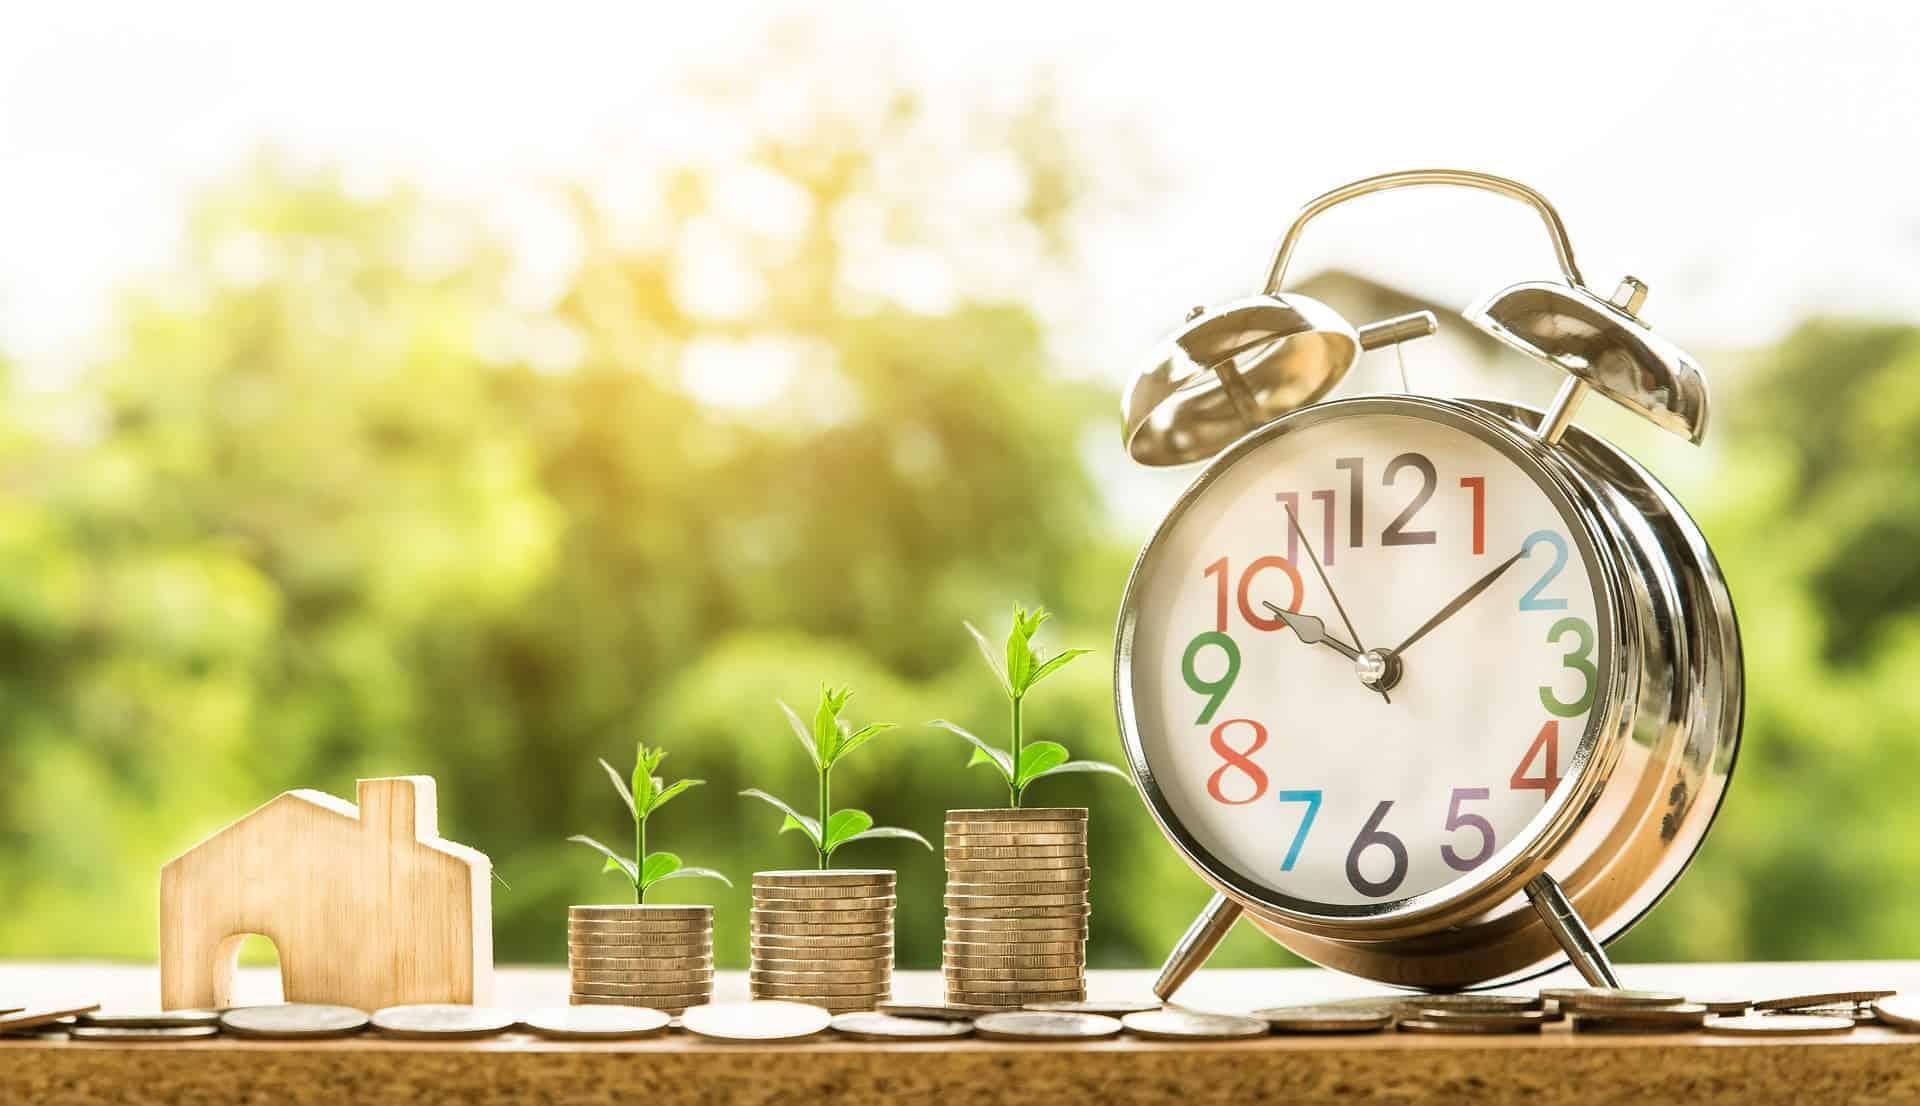 Immobilienbewertung – Oft wird es falsch gemacht